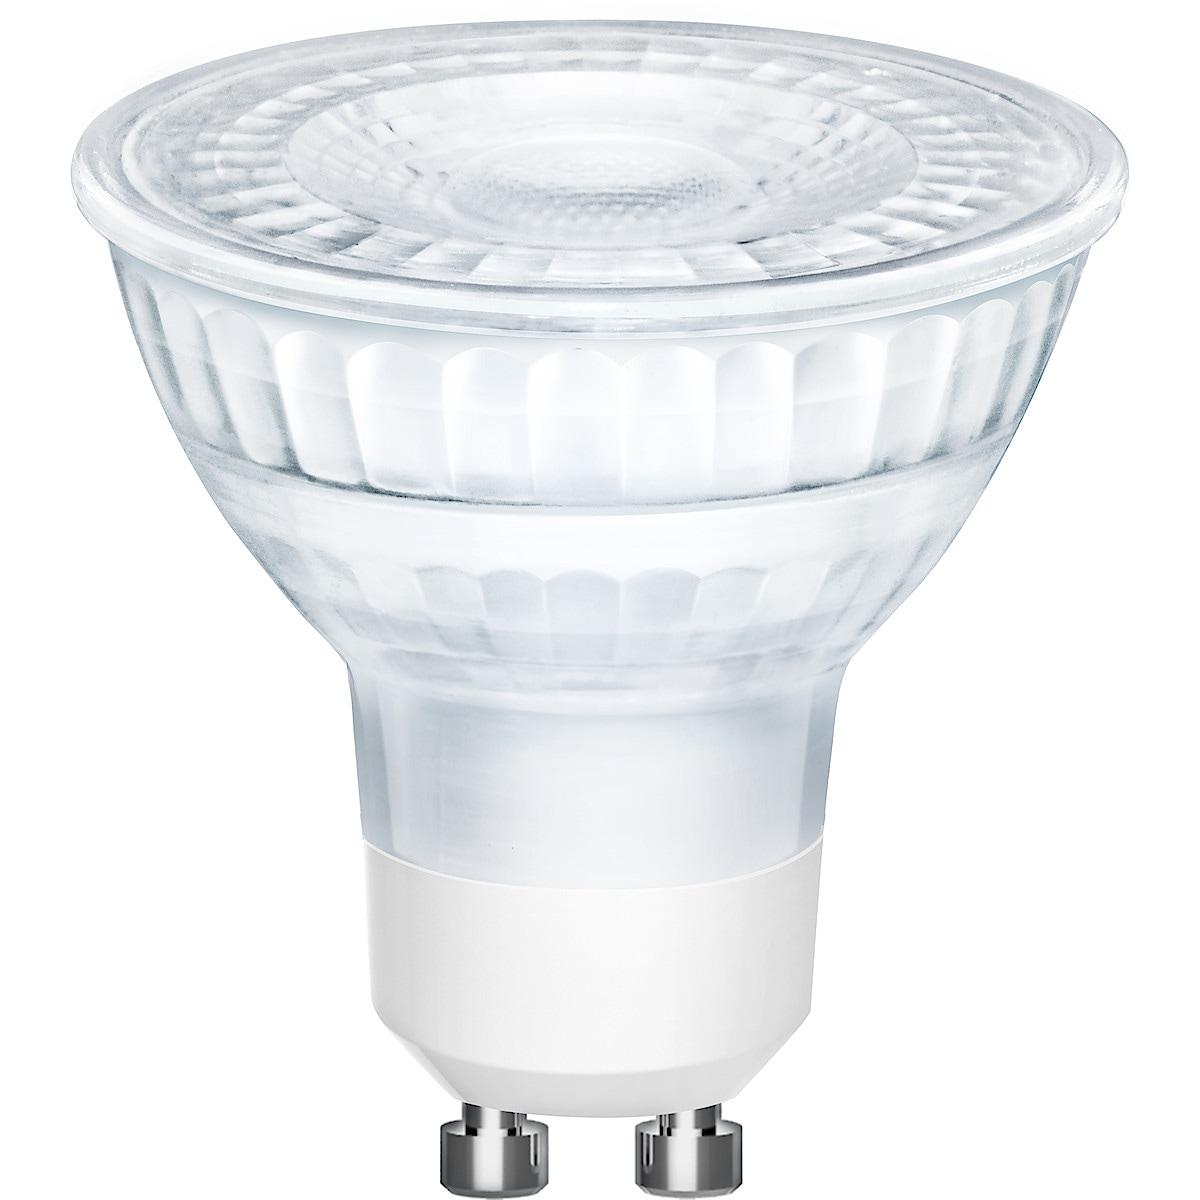 Dimringsbar LED-lampa GU10 Clas Ohlson